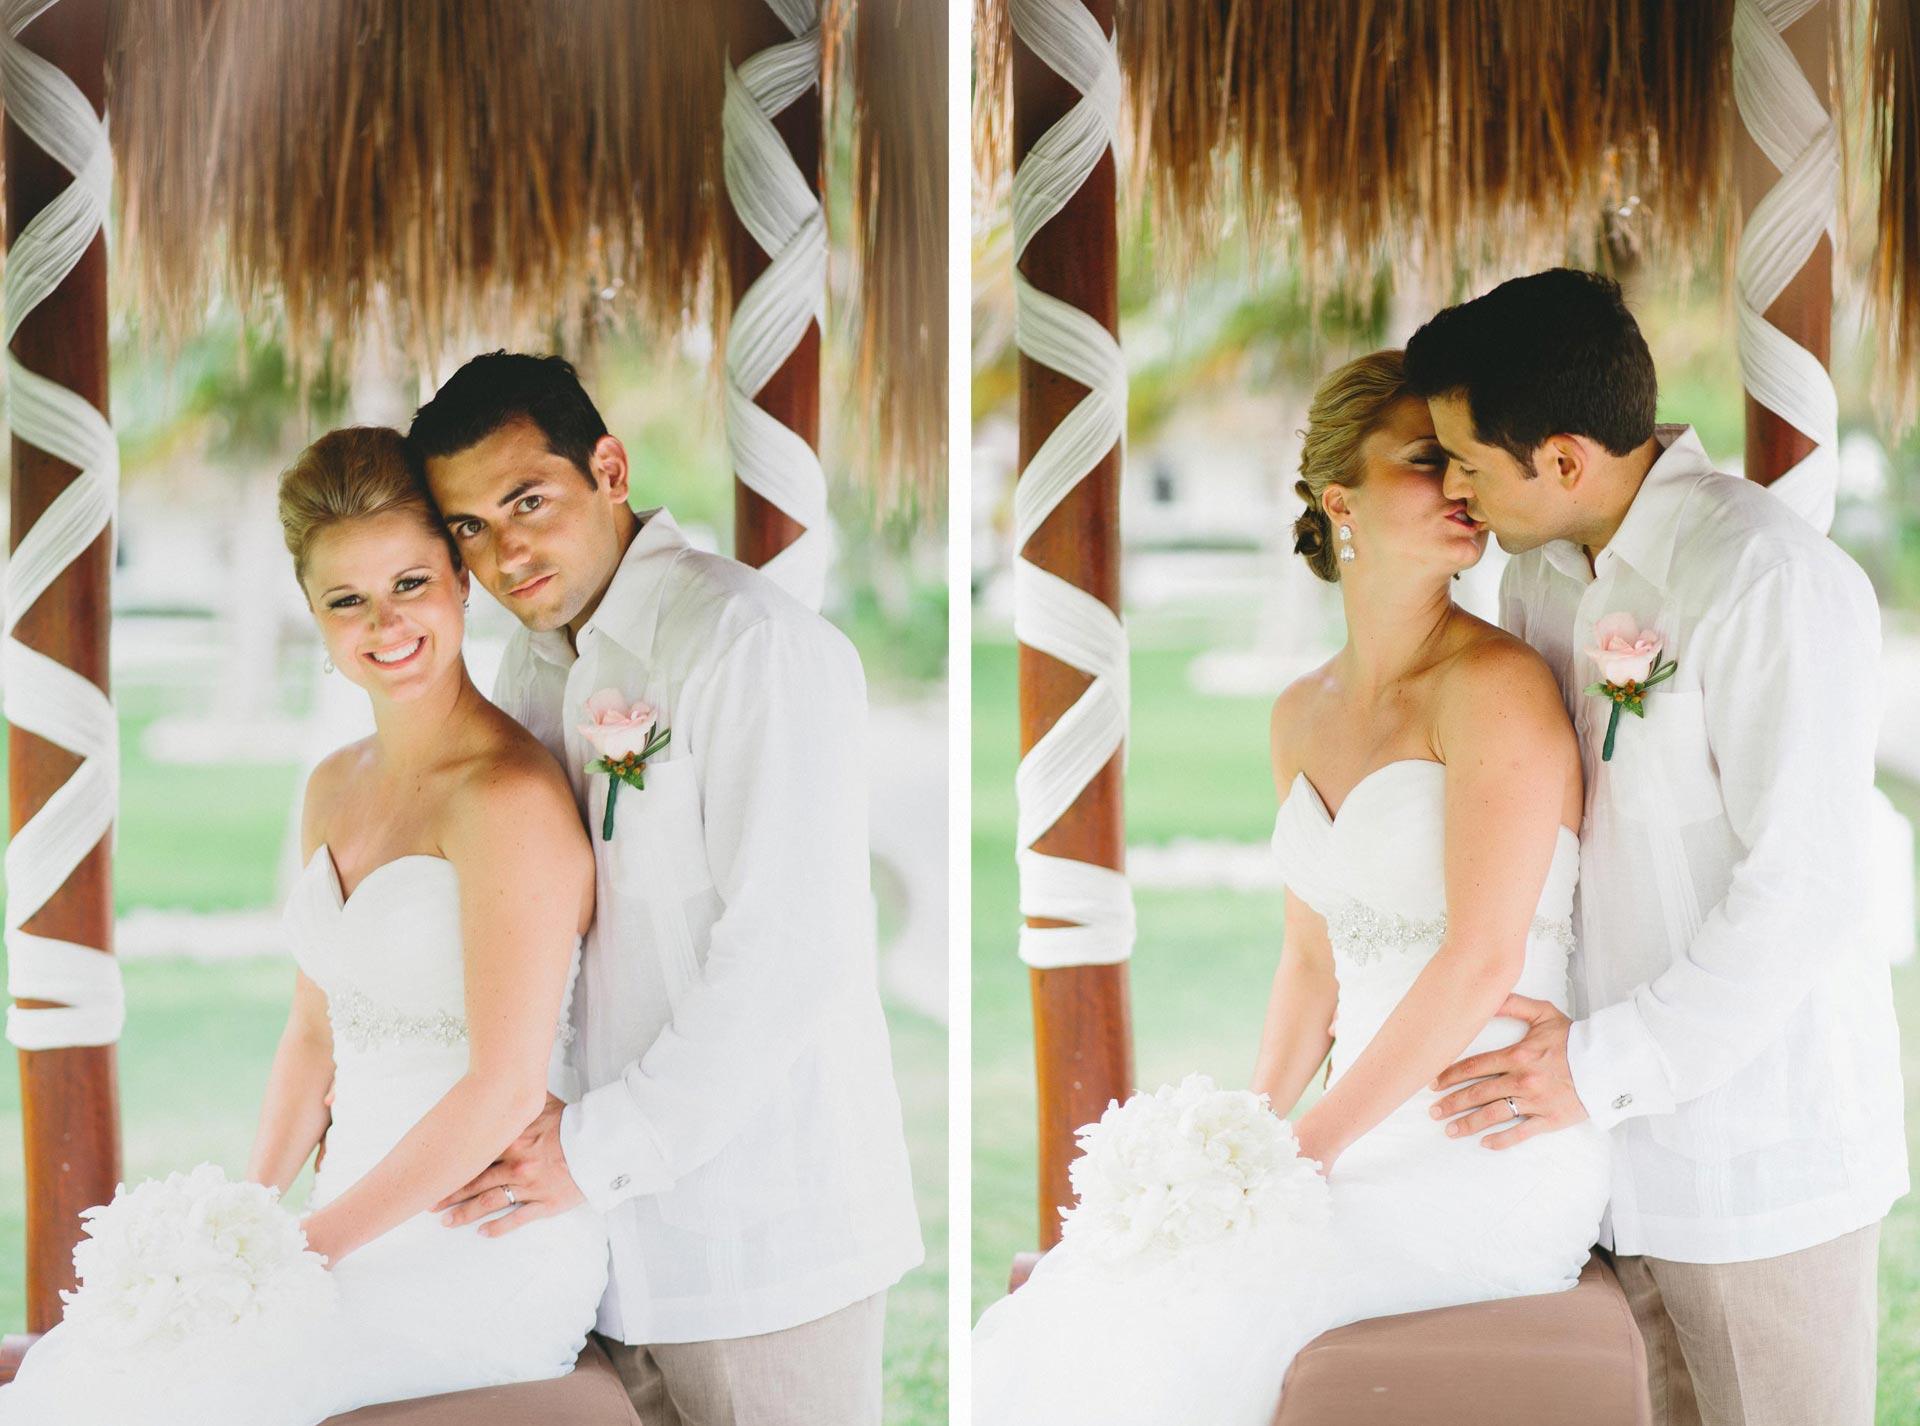 LC-Riviera-Maya-Mexico-Wedding-097@2x.jpg